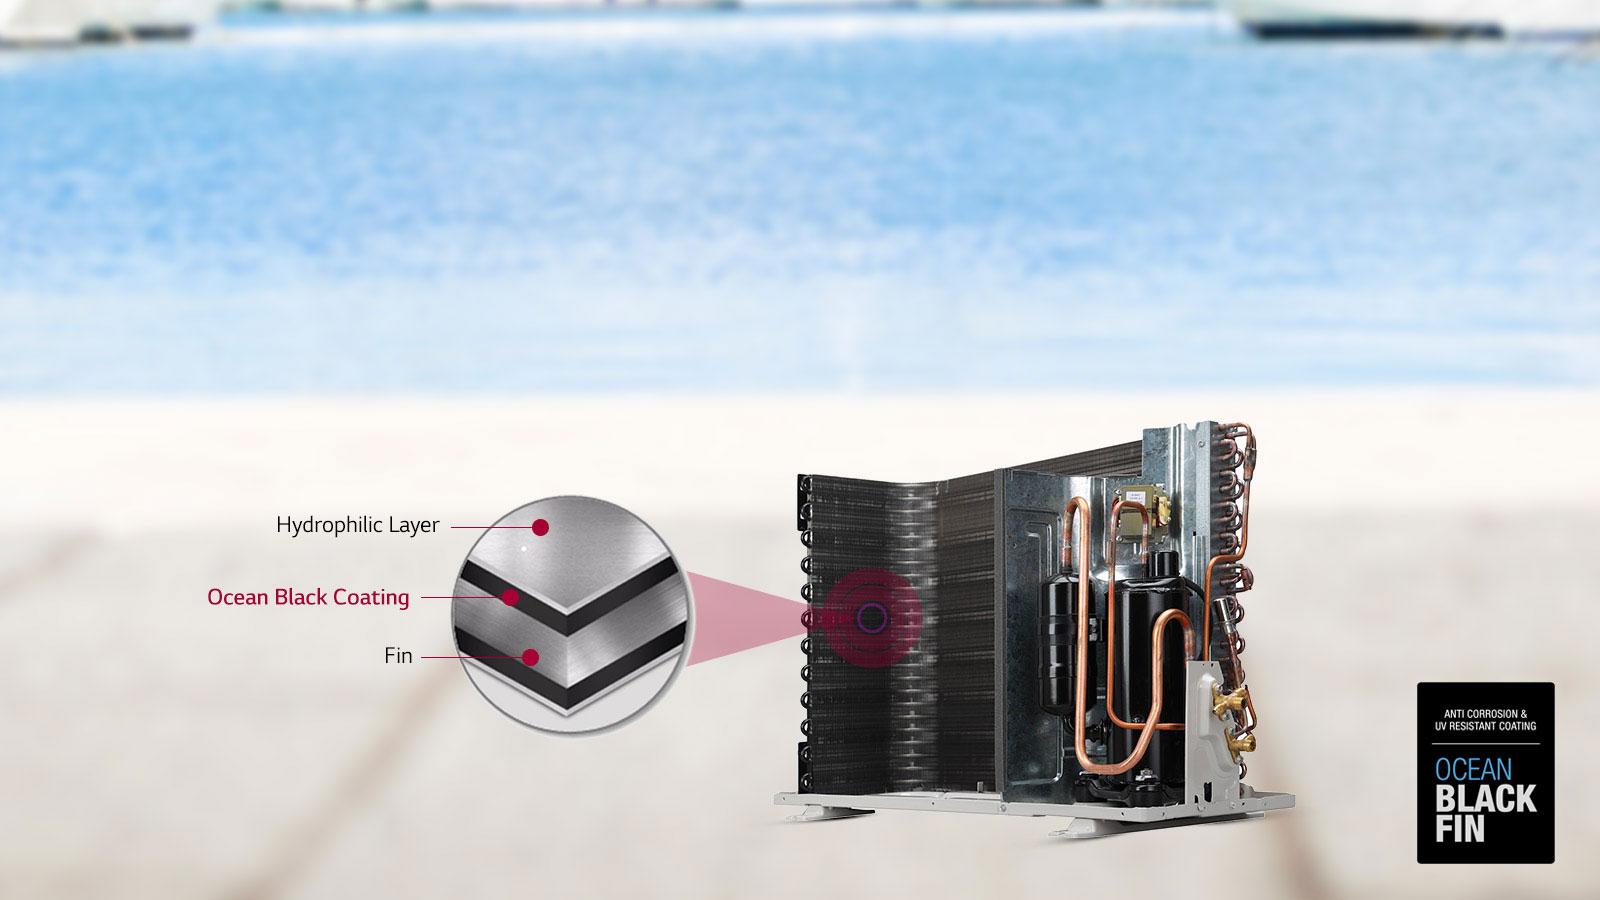 LG LS-Q18CNZD ocean black fin